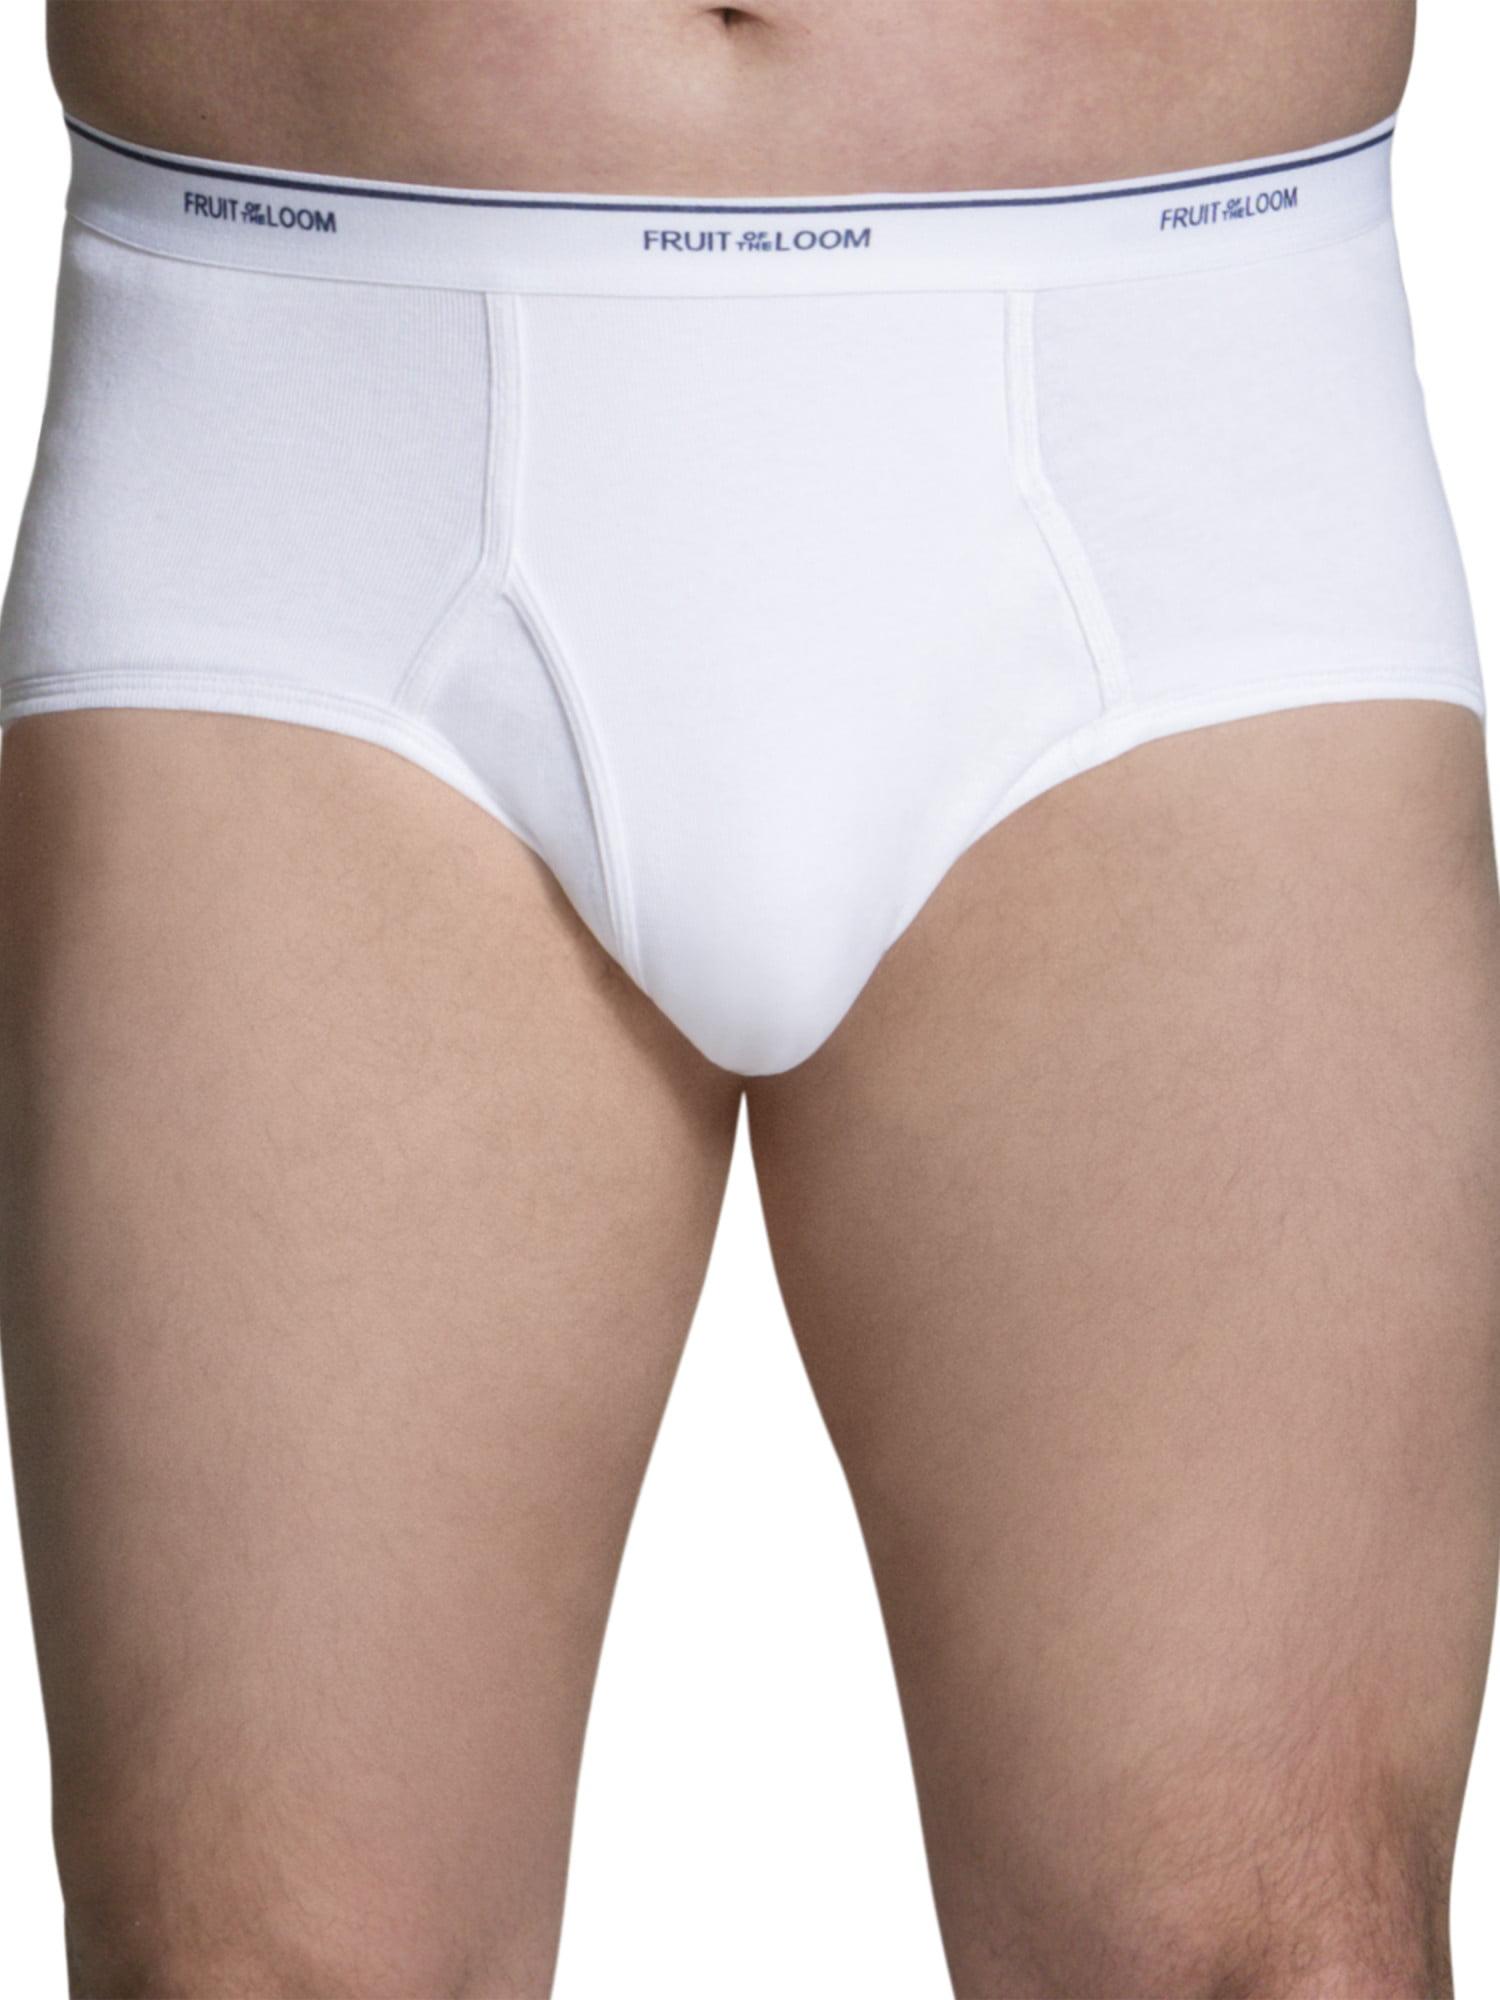 Fruit of the Loom Mens Mens Classic Slip 3 Pack Underwear